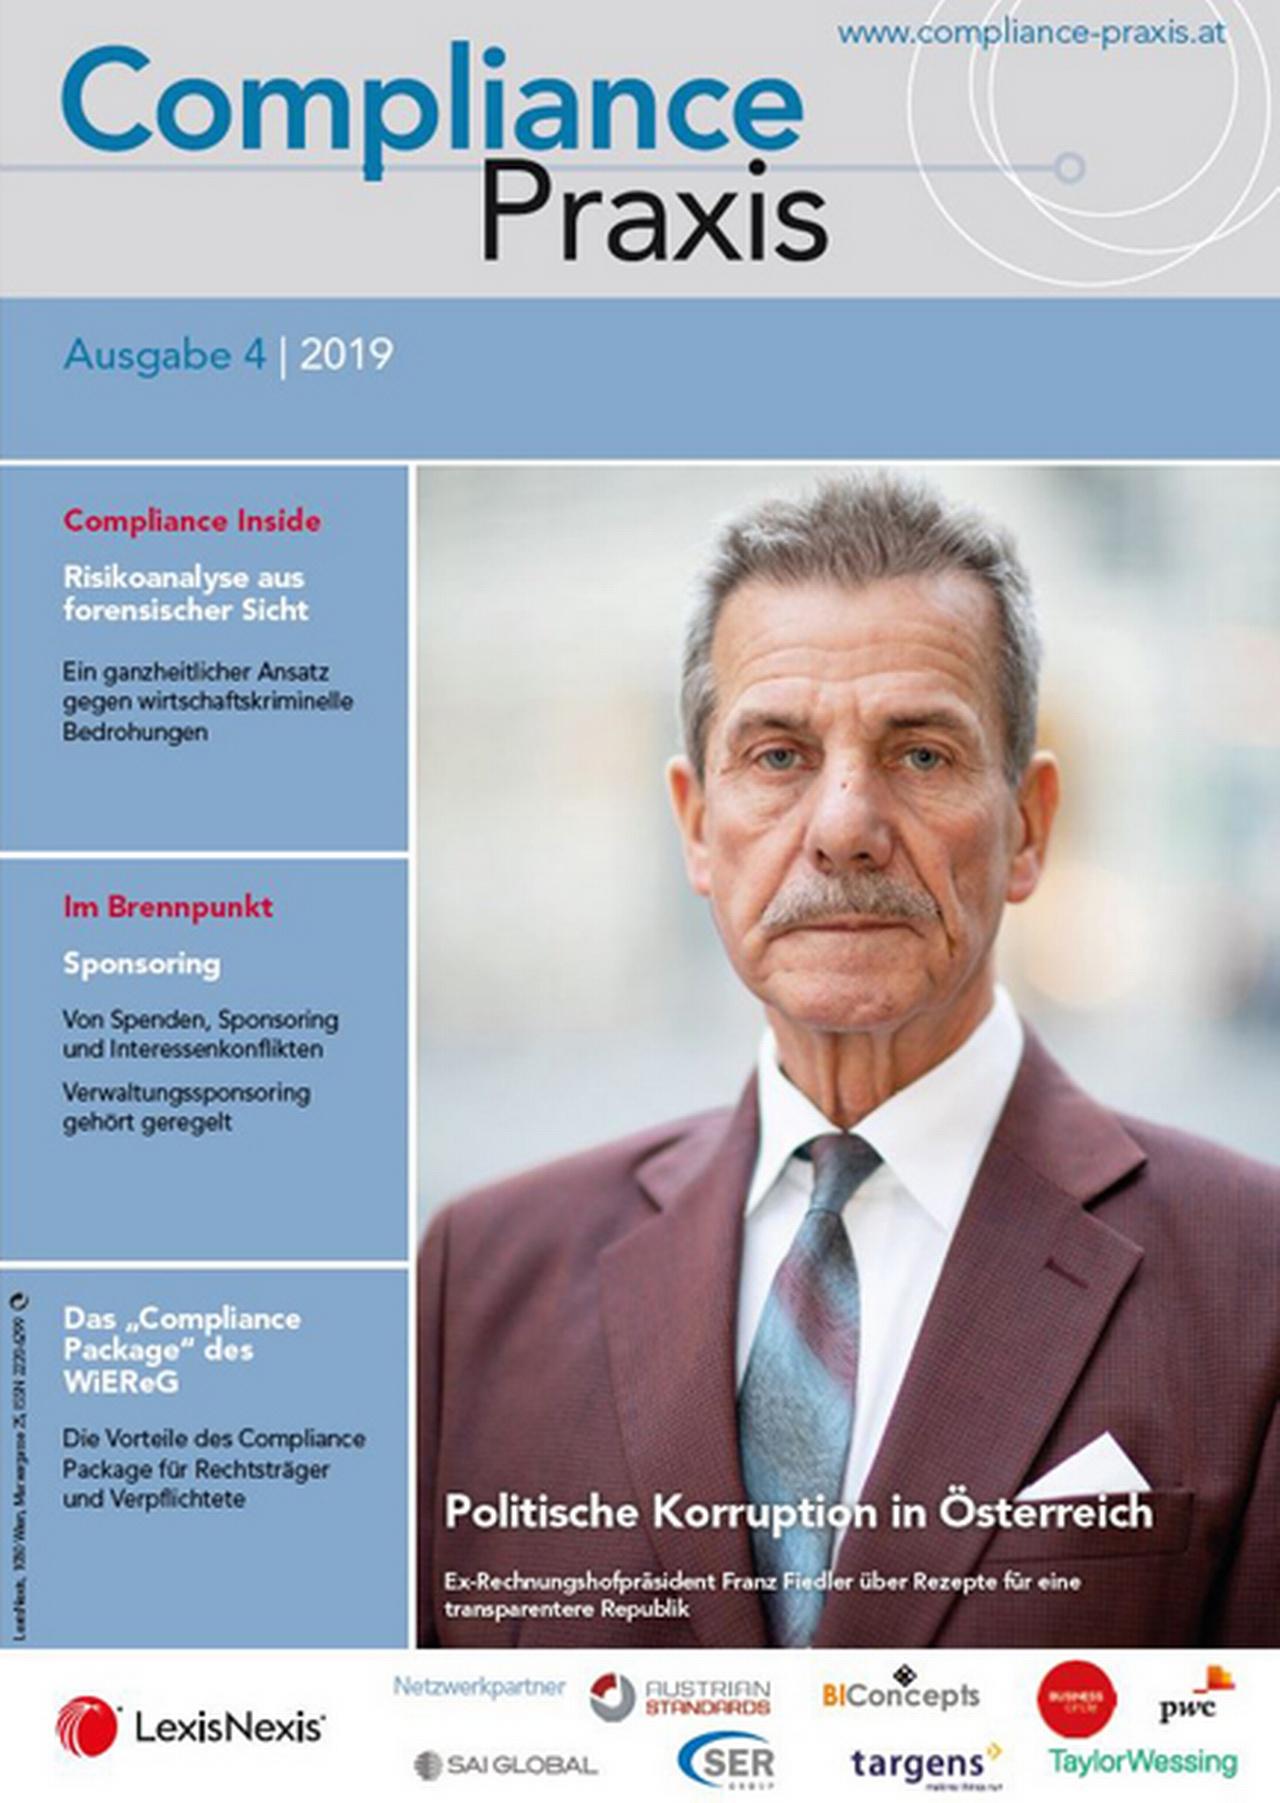 Cover von Compliance Praxis Ausgabe 4/2019, © LexisNexis